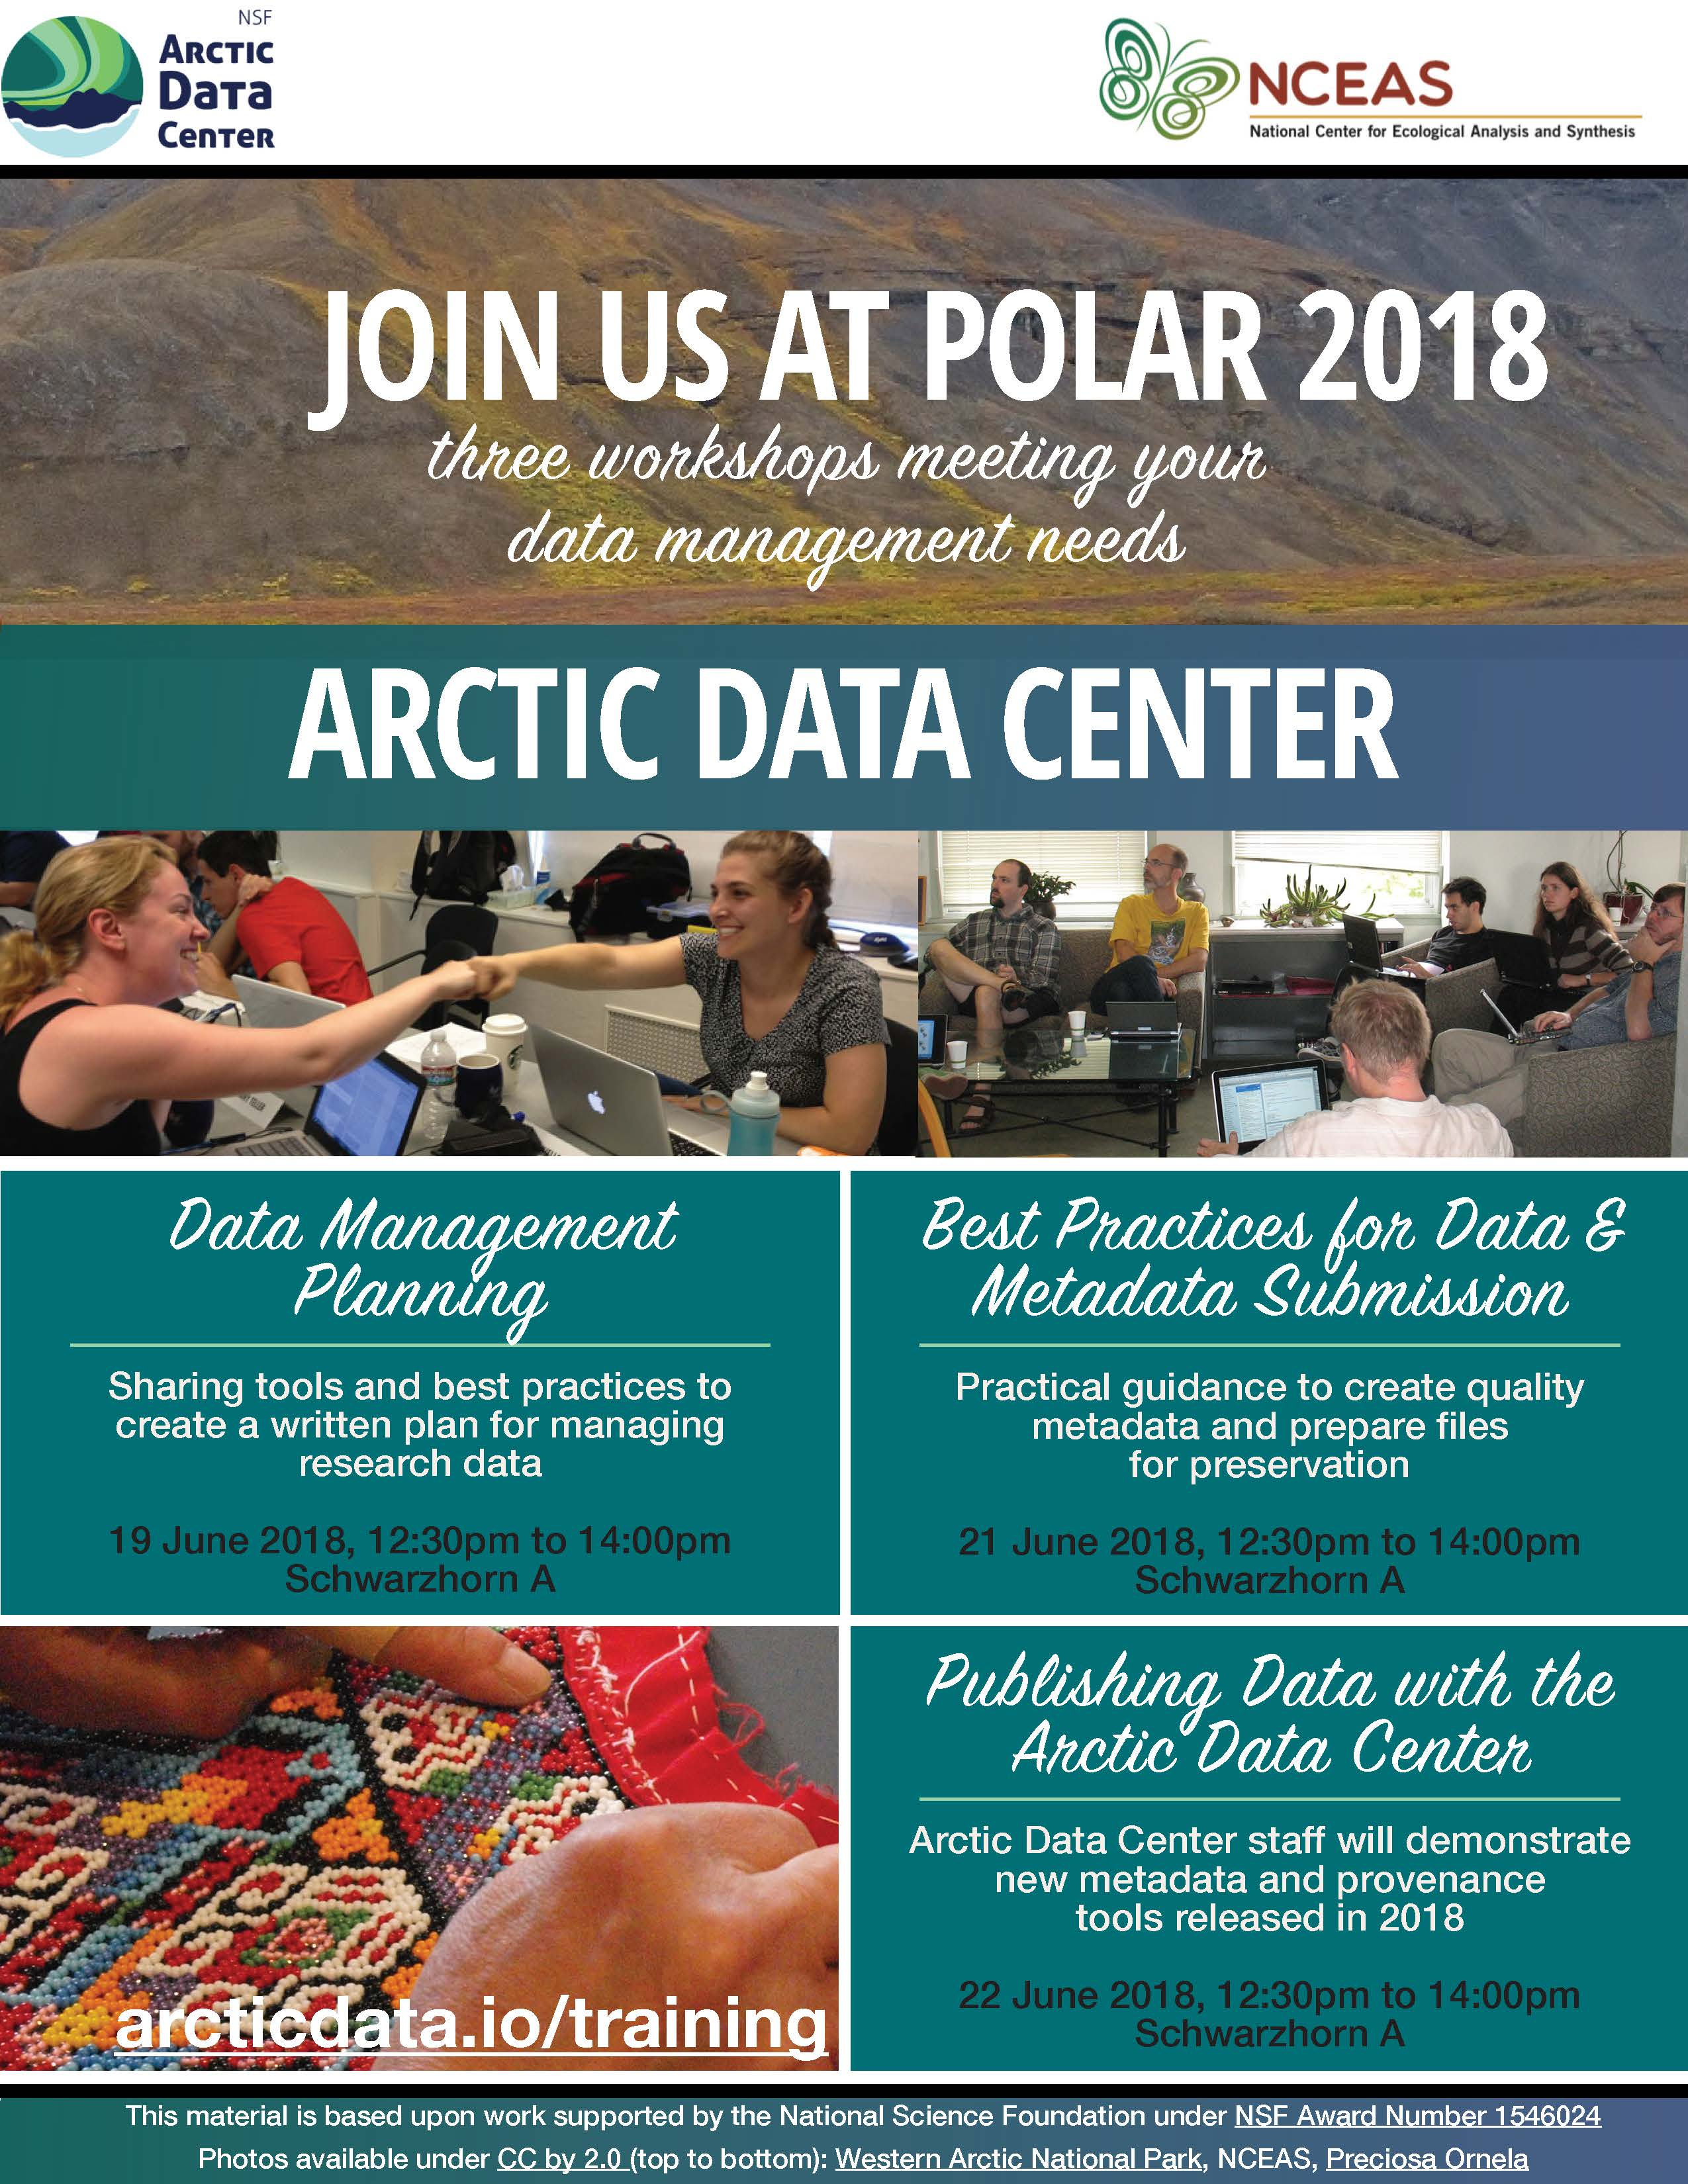 POLAR 2018 Workshops